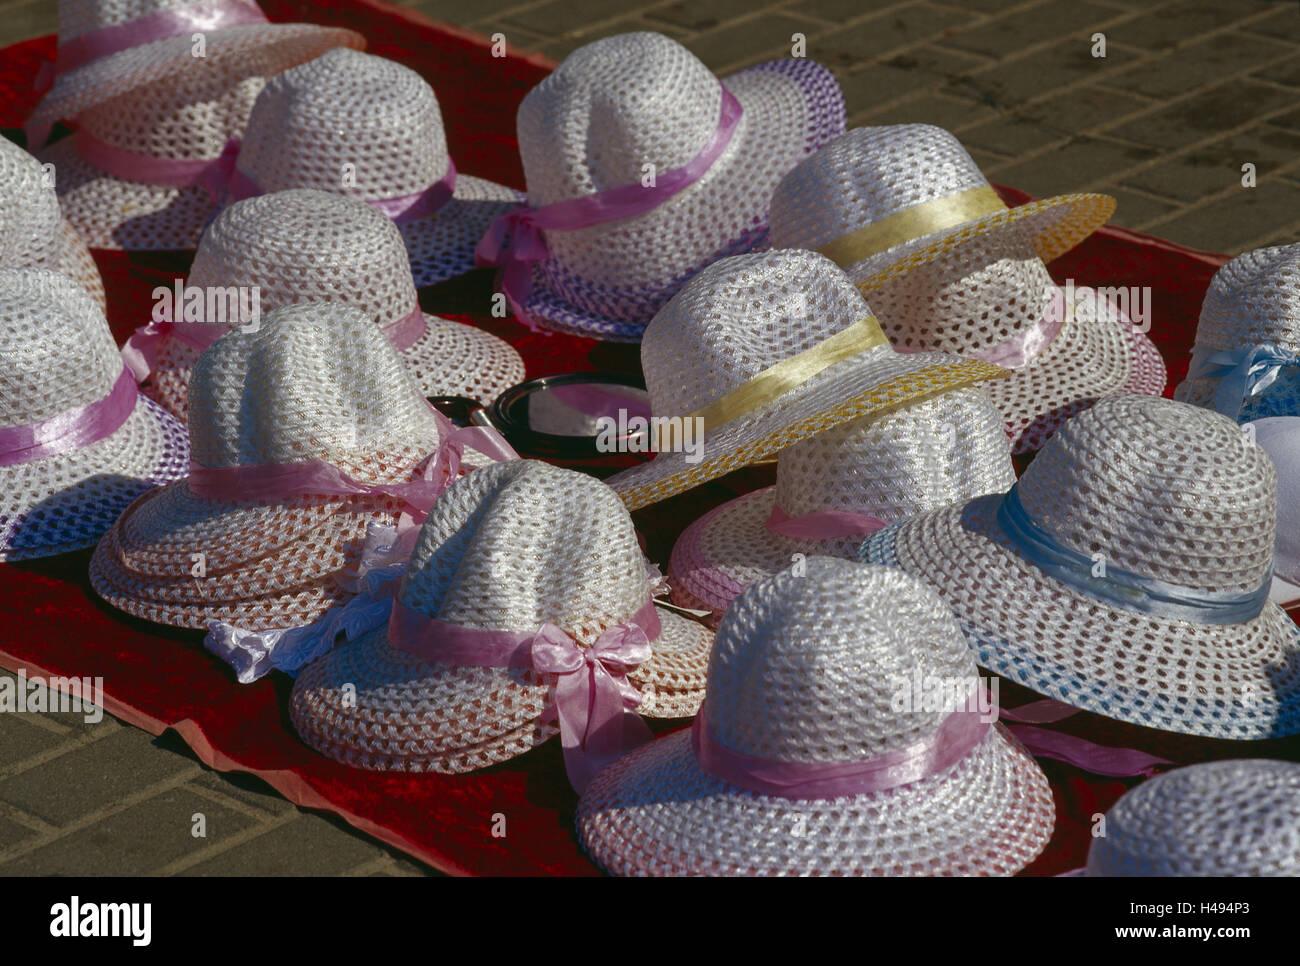 Street sales, summer hats, summers, vacation, holidays, sales, trade, hats, headgears, many, lady's hats, choice, - Stock Image